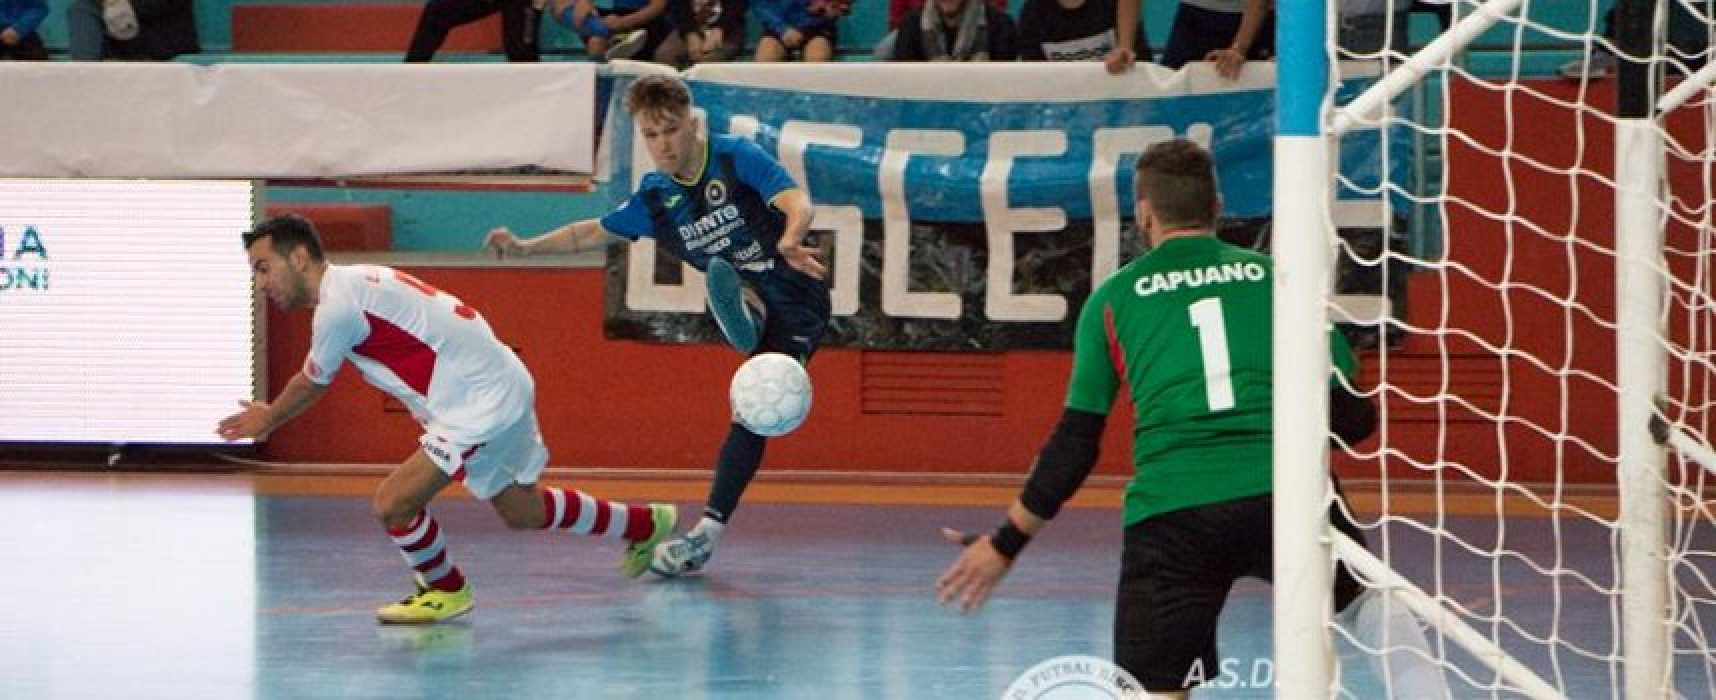 Futsal Bisceglie – Barletta 3-3 / HIGHLIGHTS VIDEO